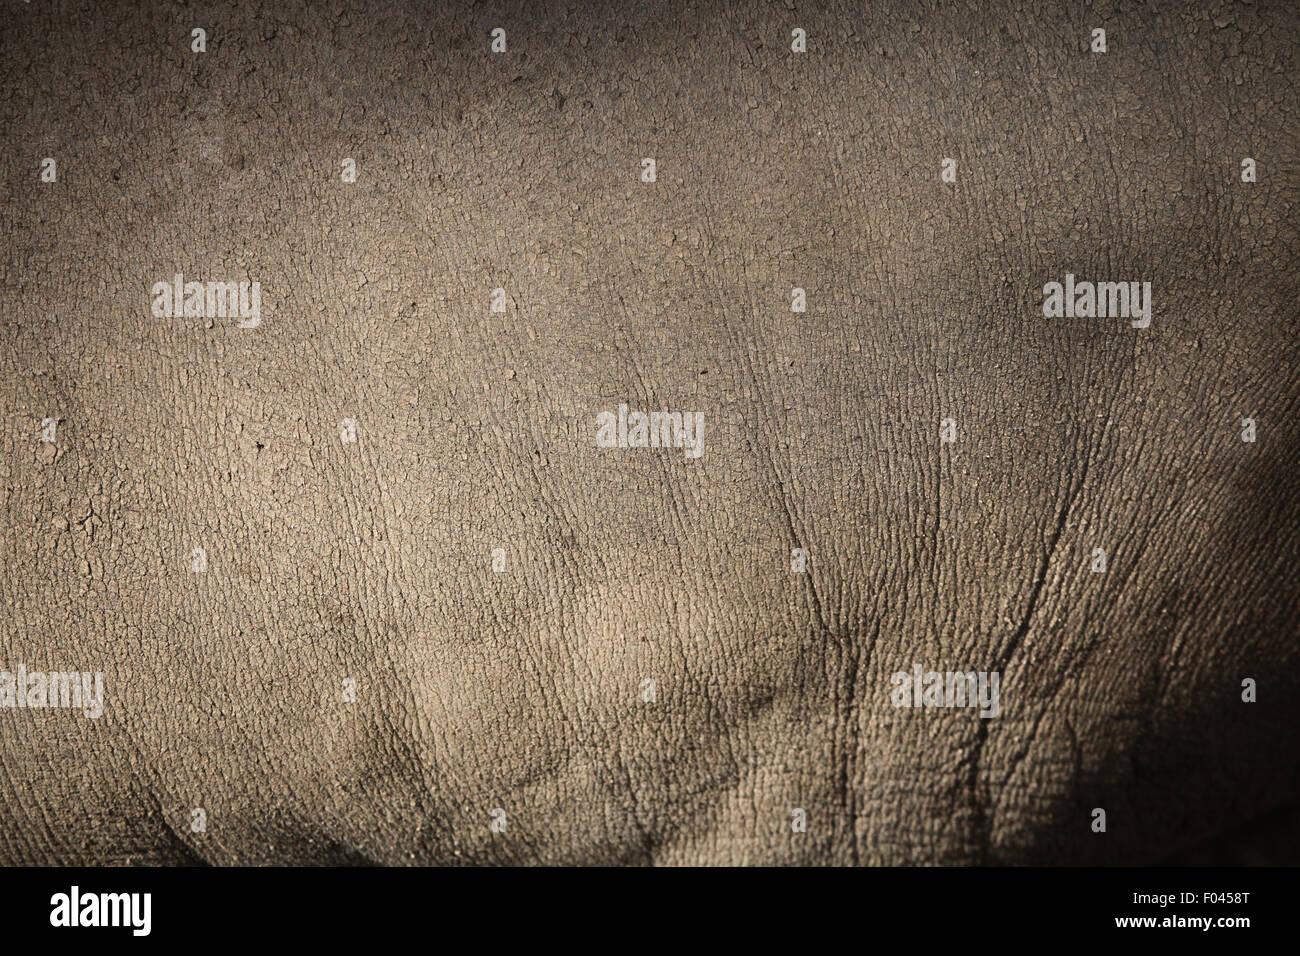 Sulawesi babirusa (Babyrousa celebensis) skin texture. Wild life animal. - Stock Image